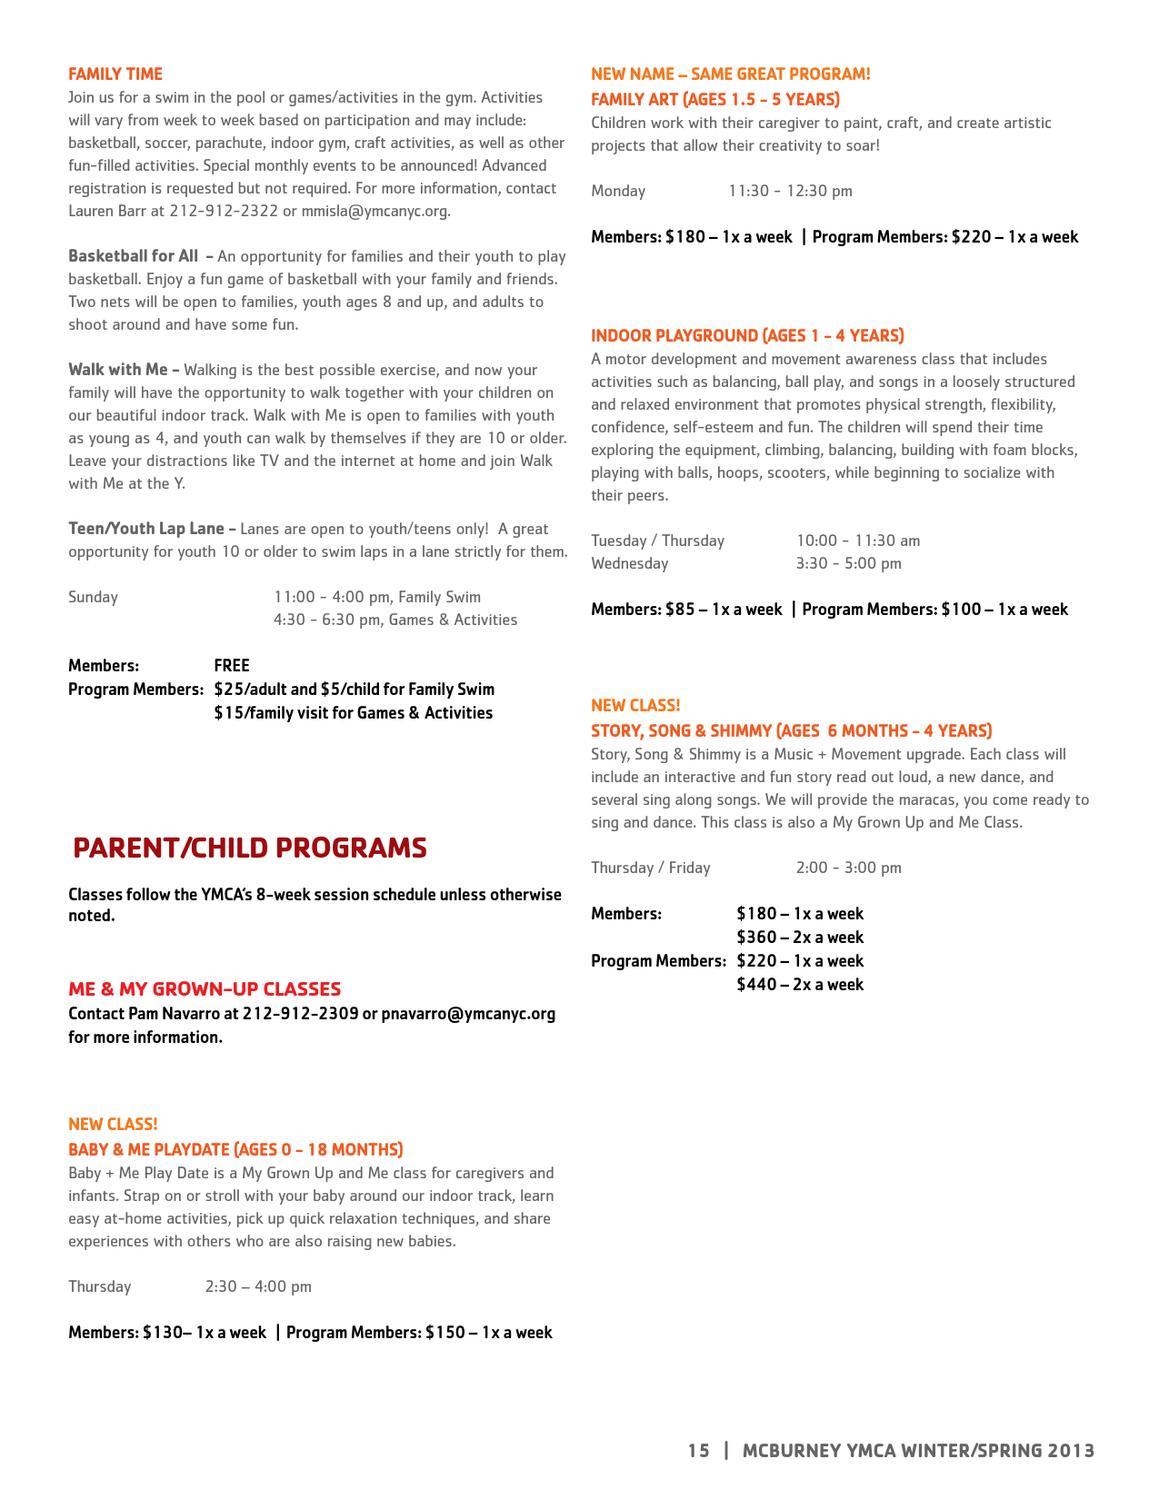 McBurney YMCA Winter-Spring2013 Program Guide by New York